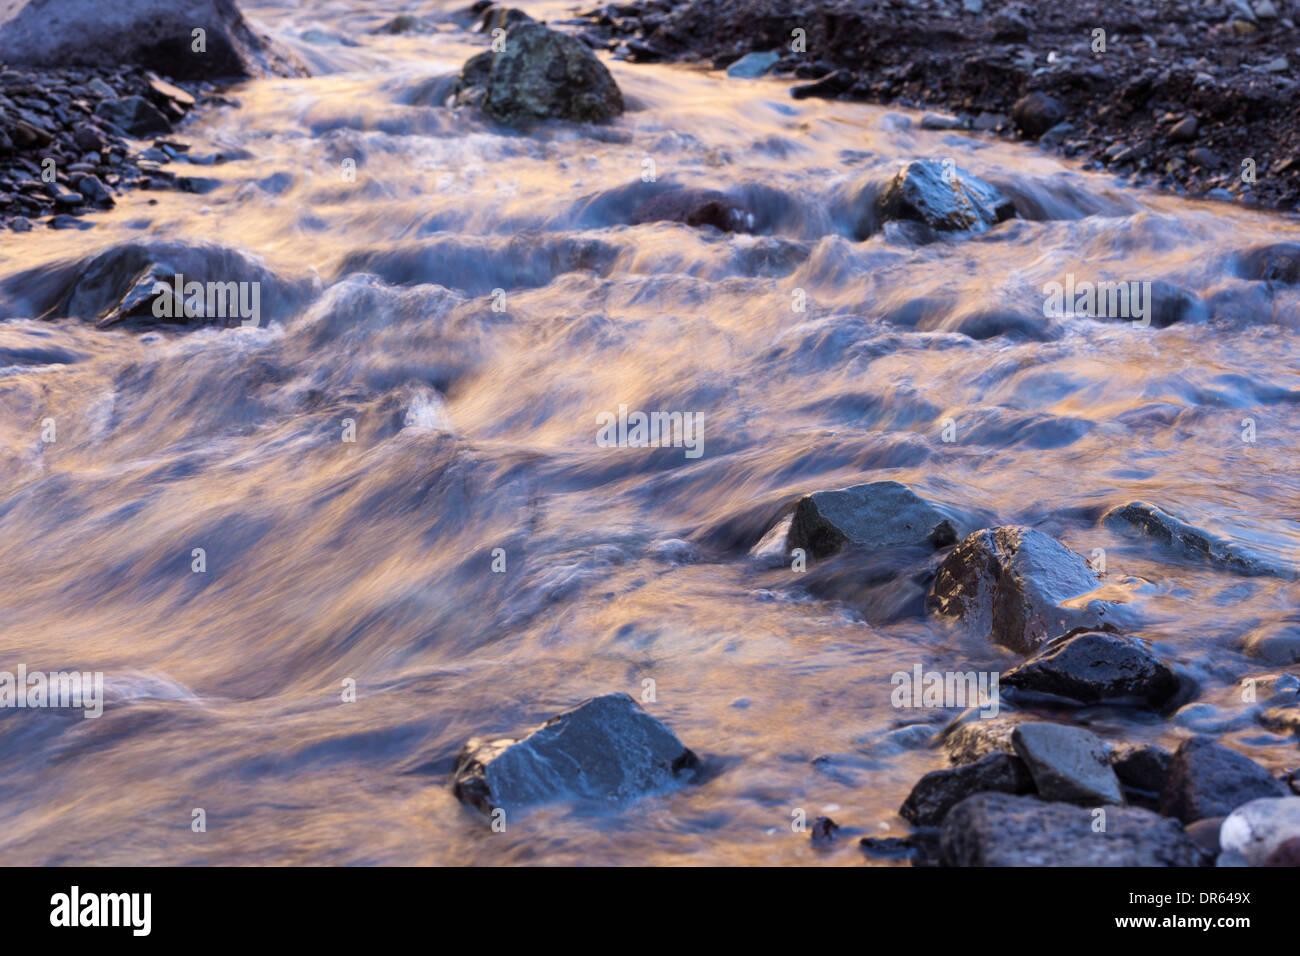 stream-of-water-flowing-over-stones-in-t